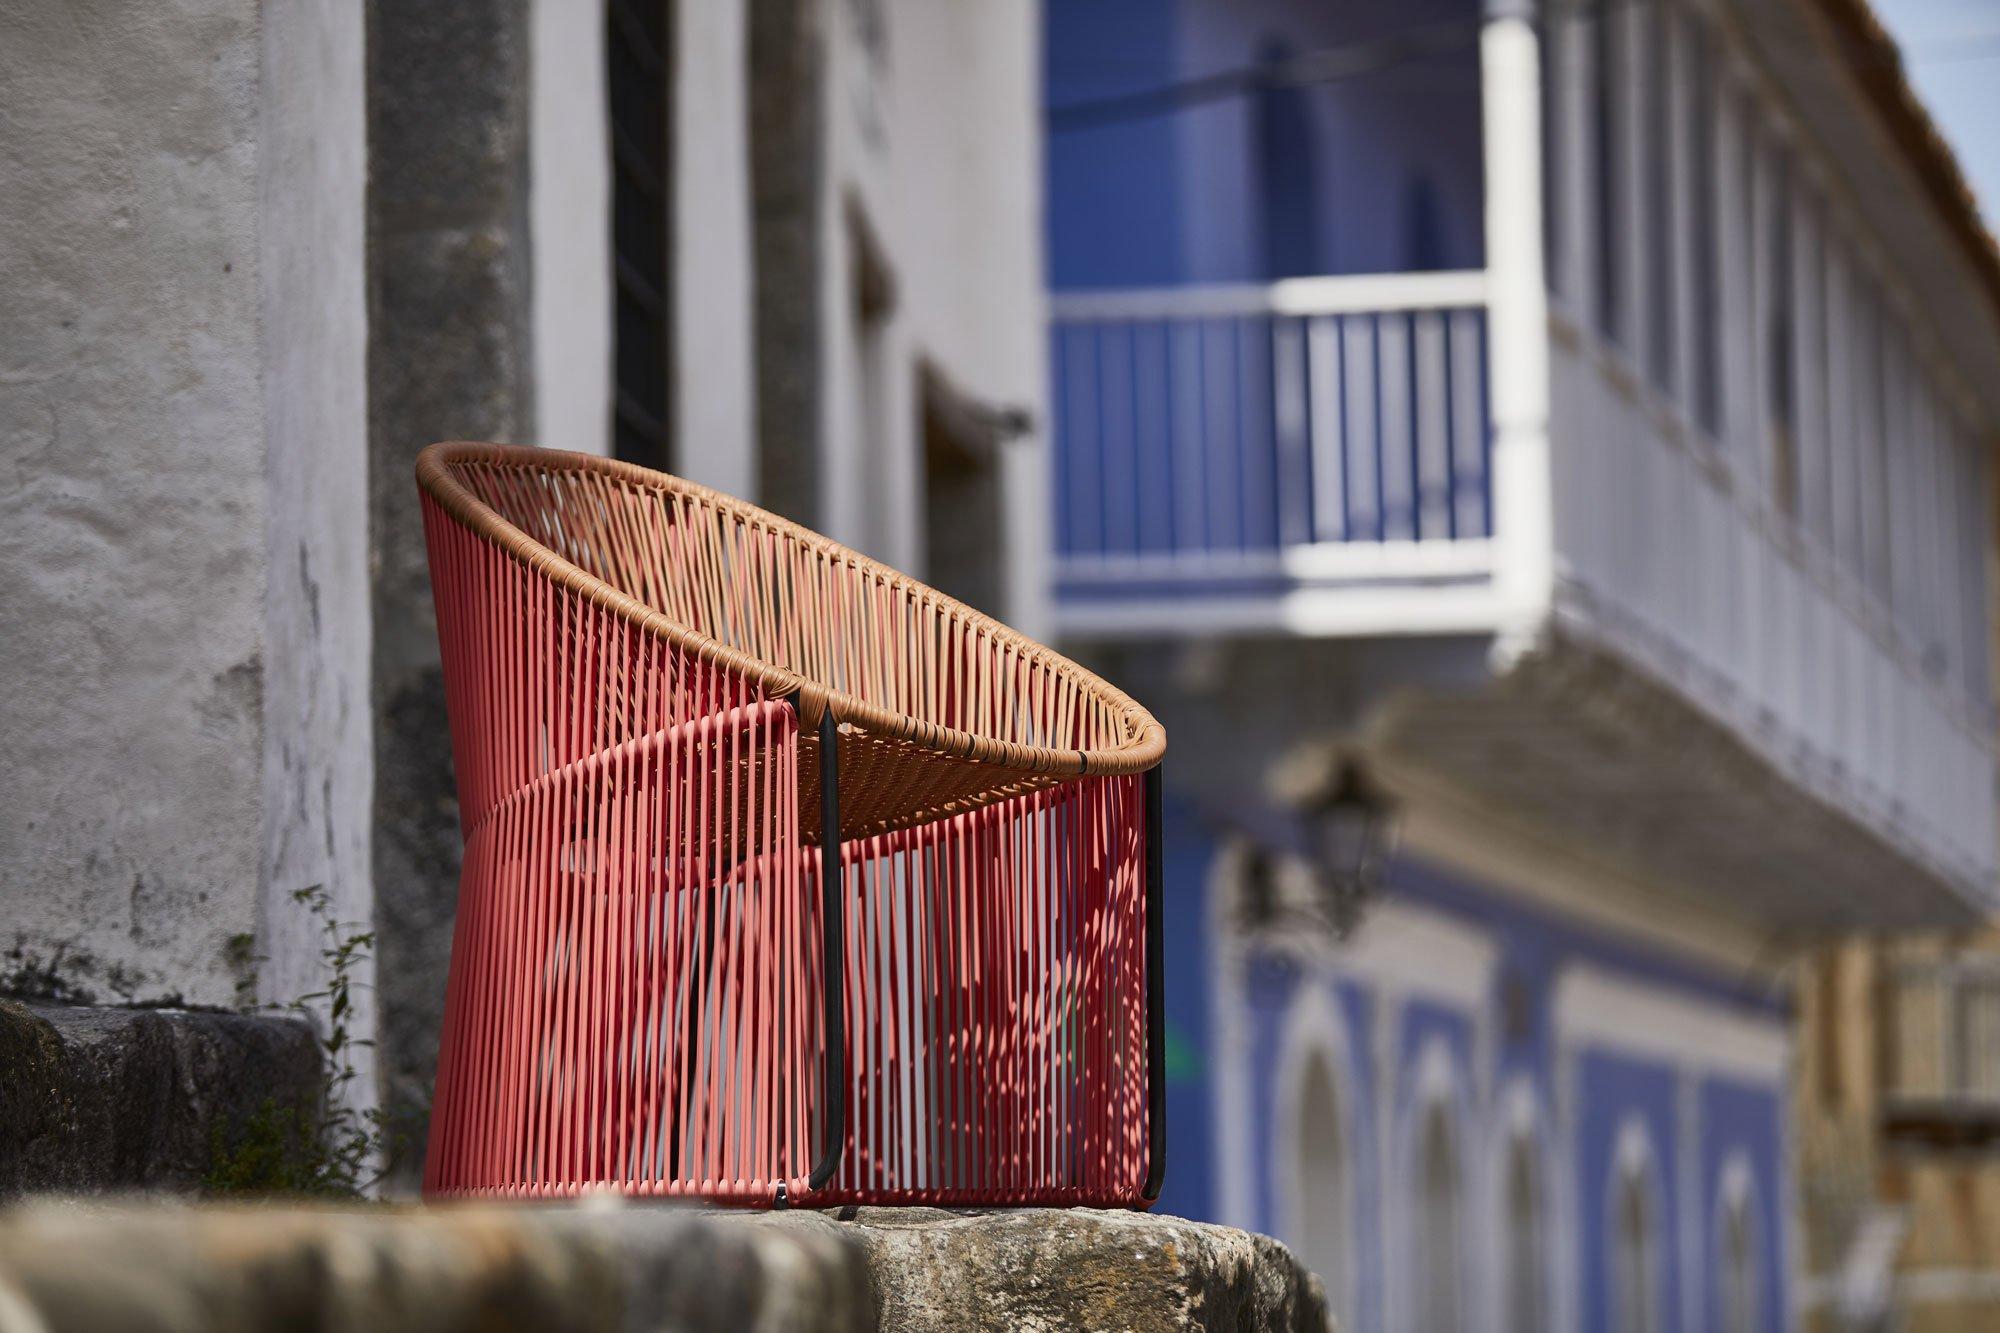 Outdoor-Möbel & Outdoor-KüchenSebastian Herkner, Sessel Cartagenas, Ames. Foto/ Copyright: Ames